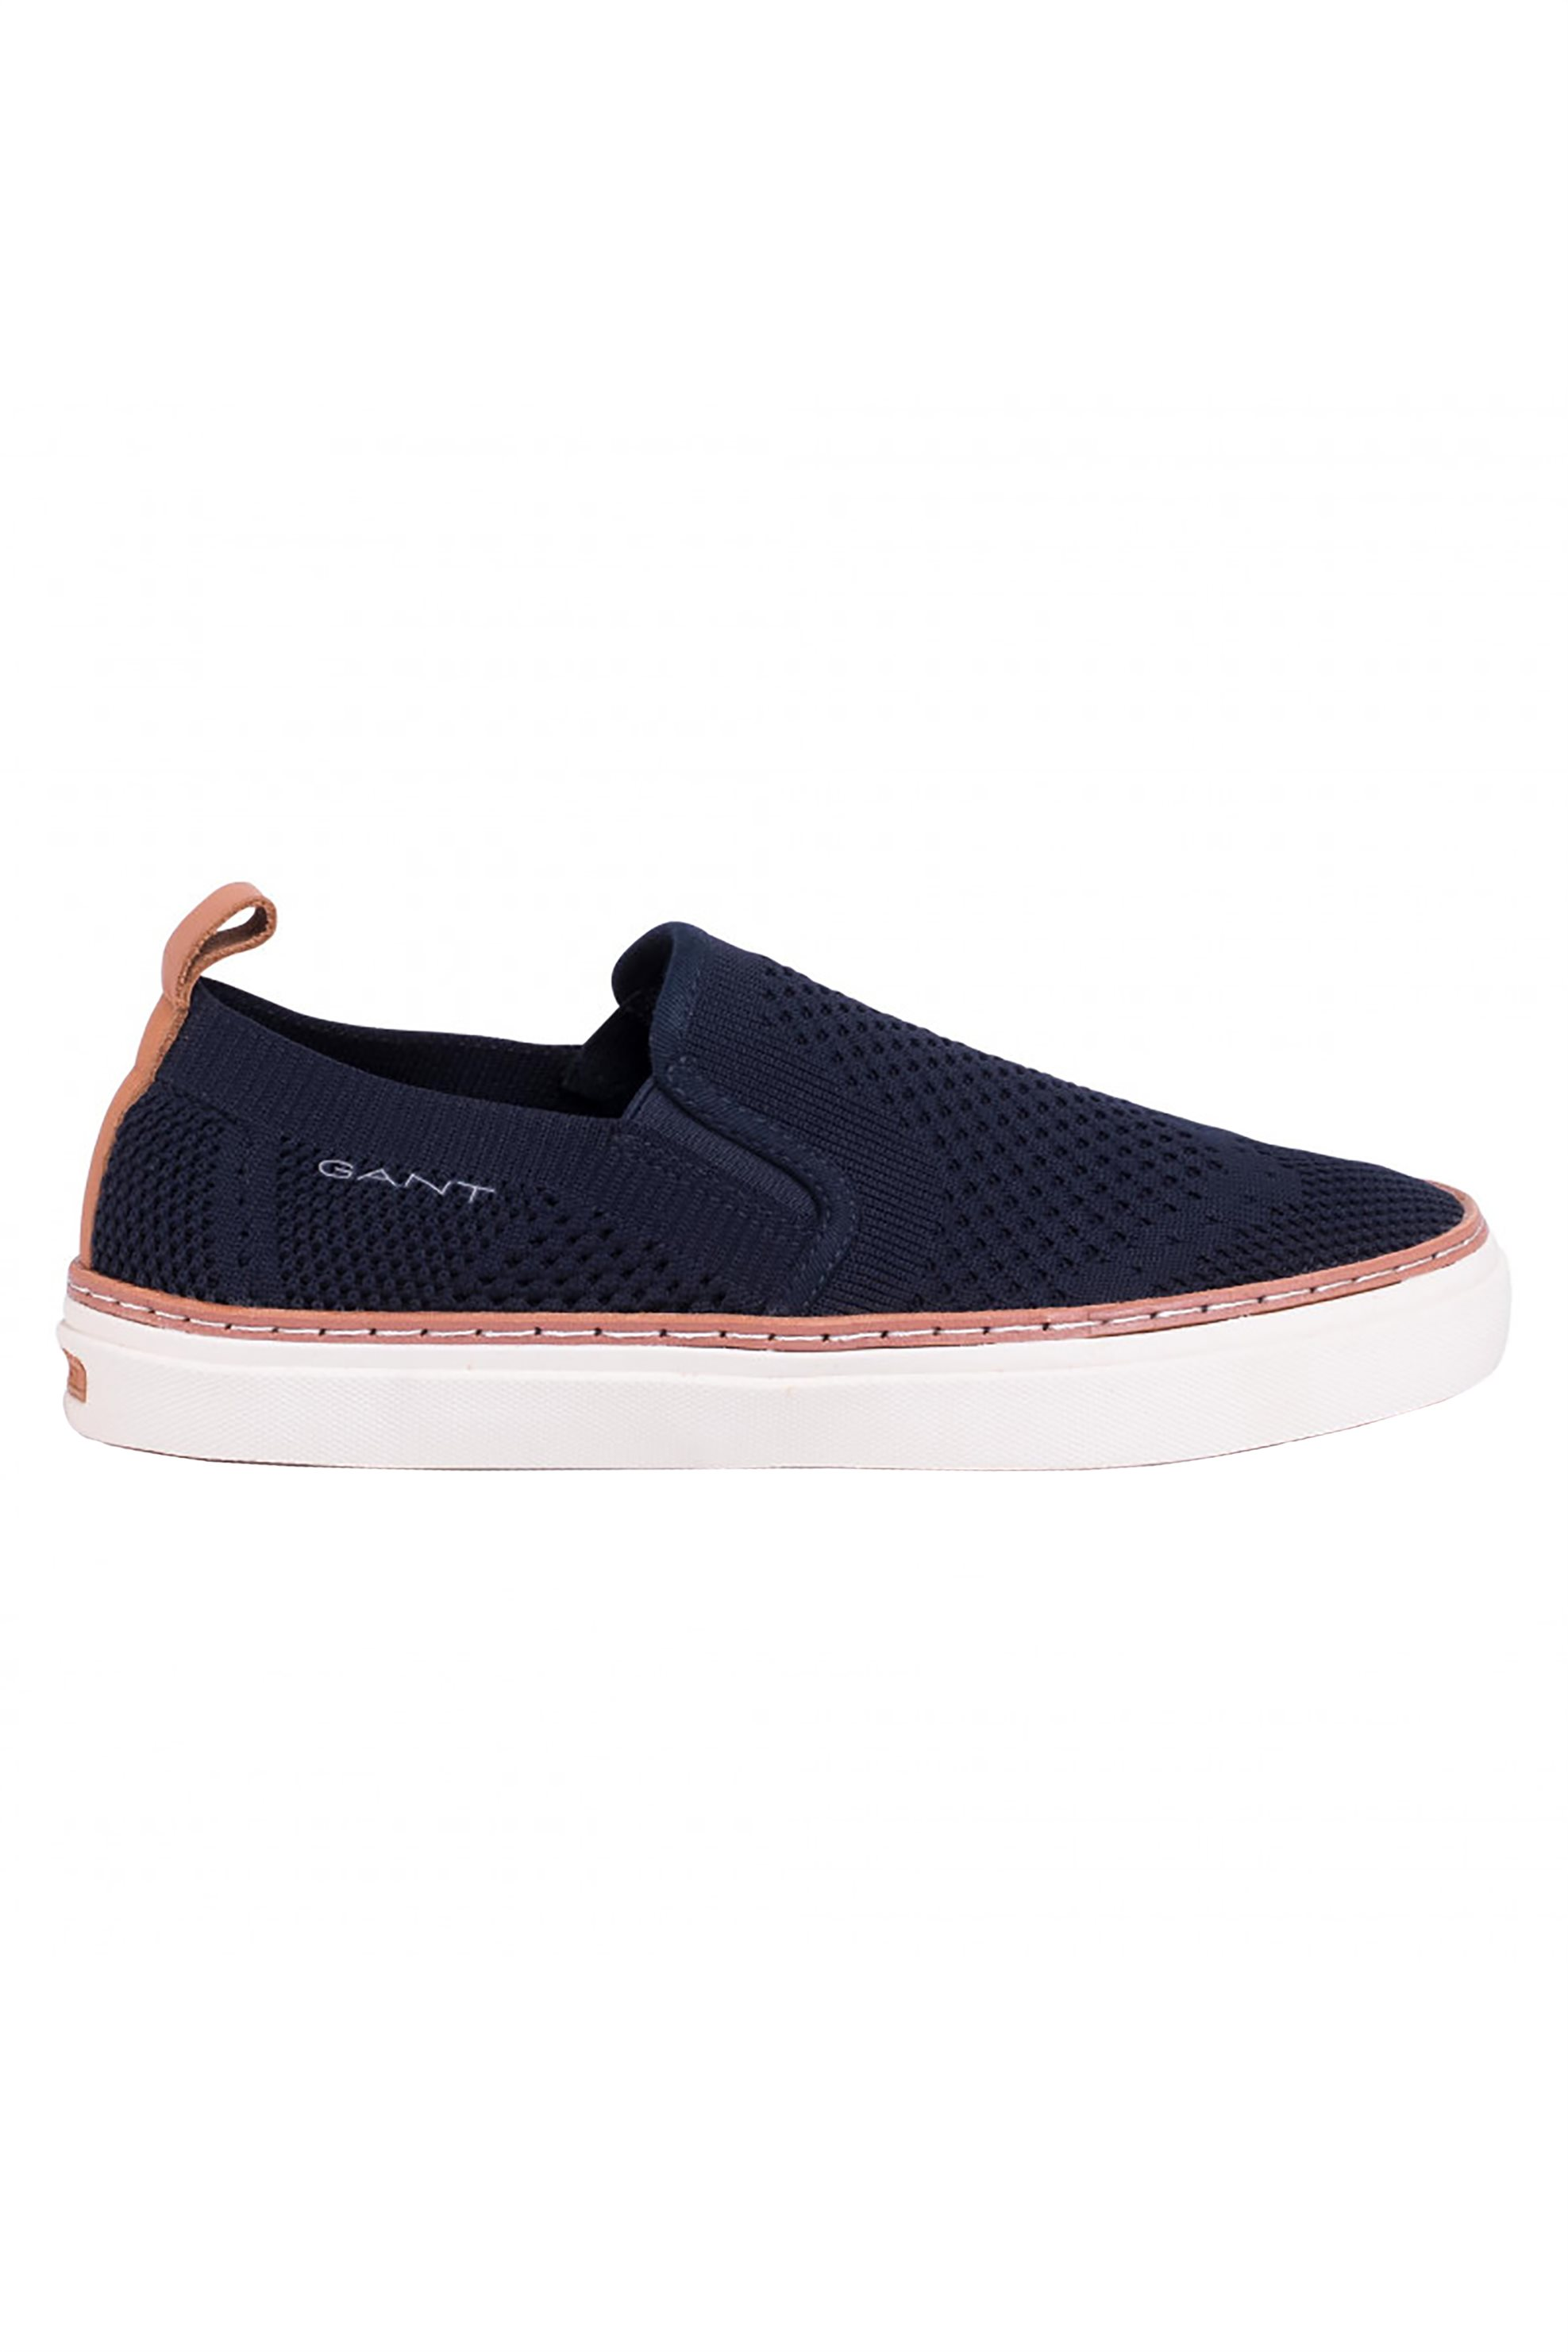 "Gant ανδρικά loafers με δερμάτινες λεπτομέρειες ""Prepville"" – 20677428 – Μπλε Σκούρο"